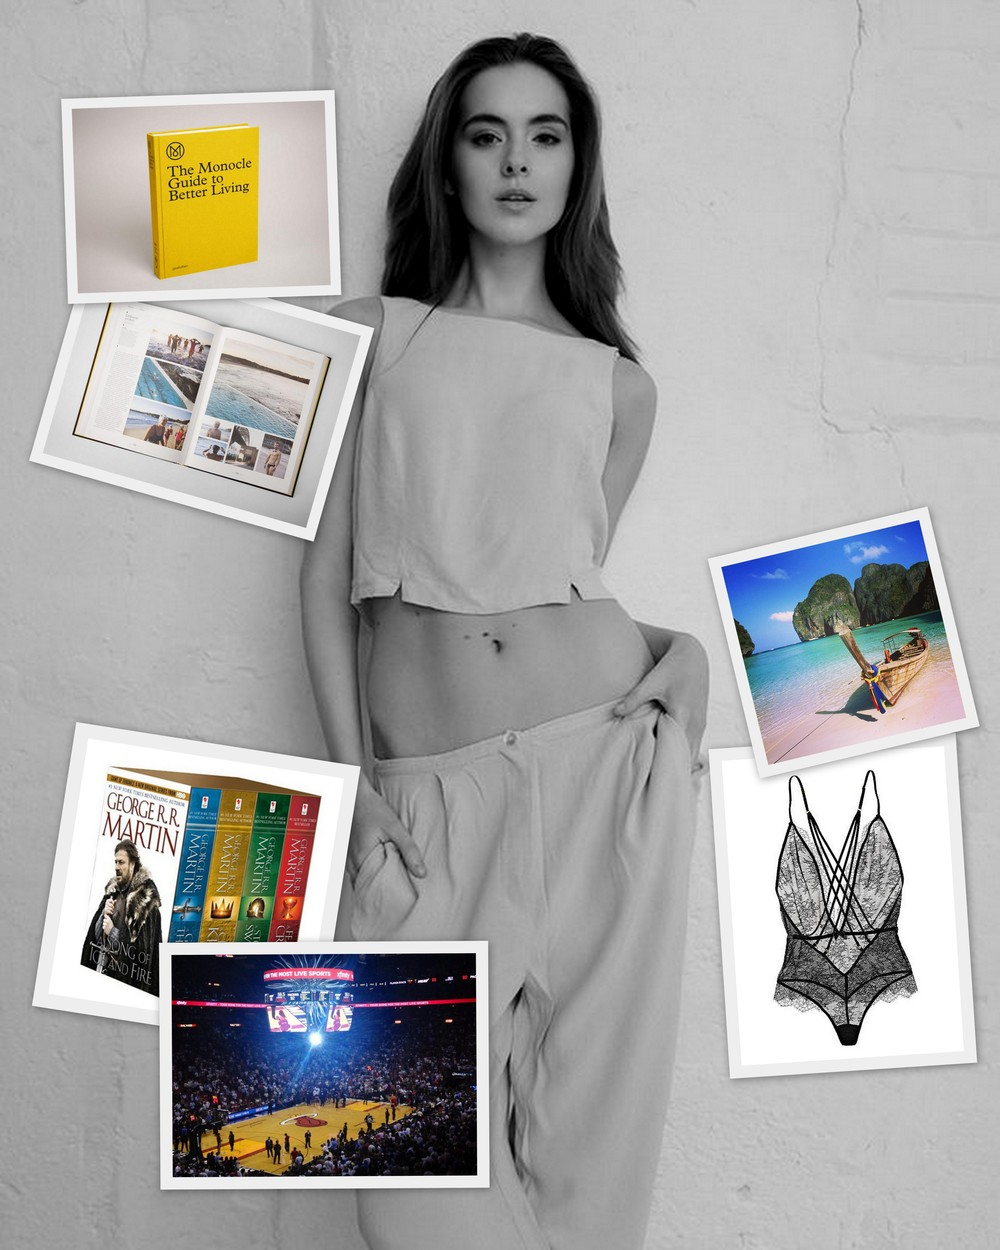 Original image of Natalia by Stefan Kolesnikowicz